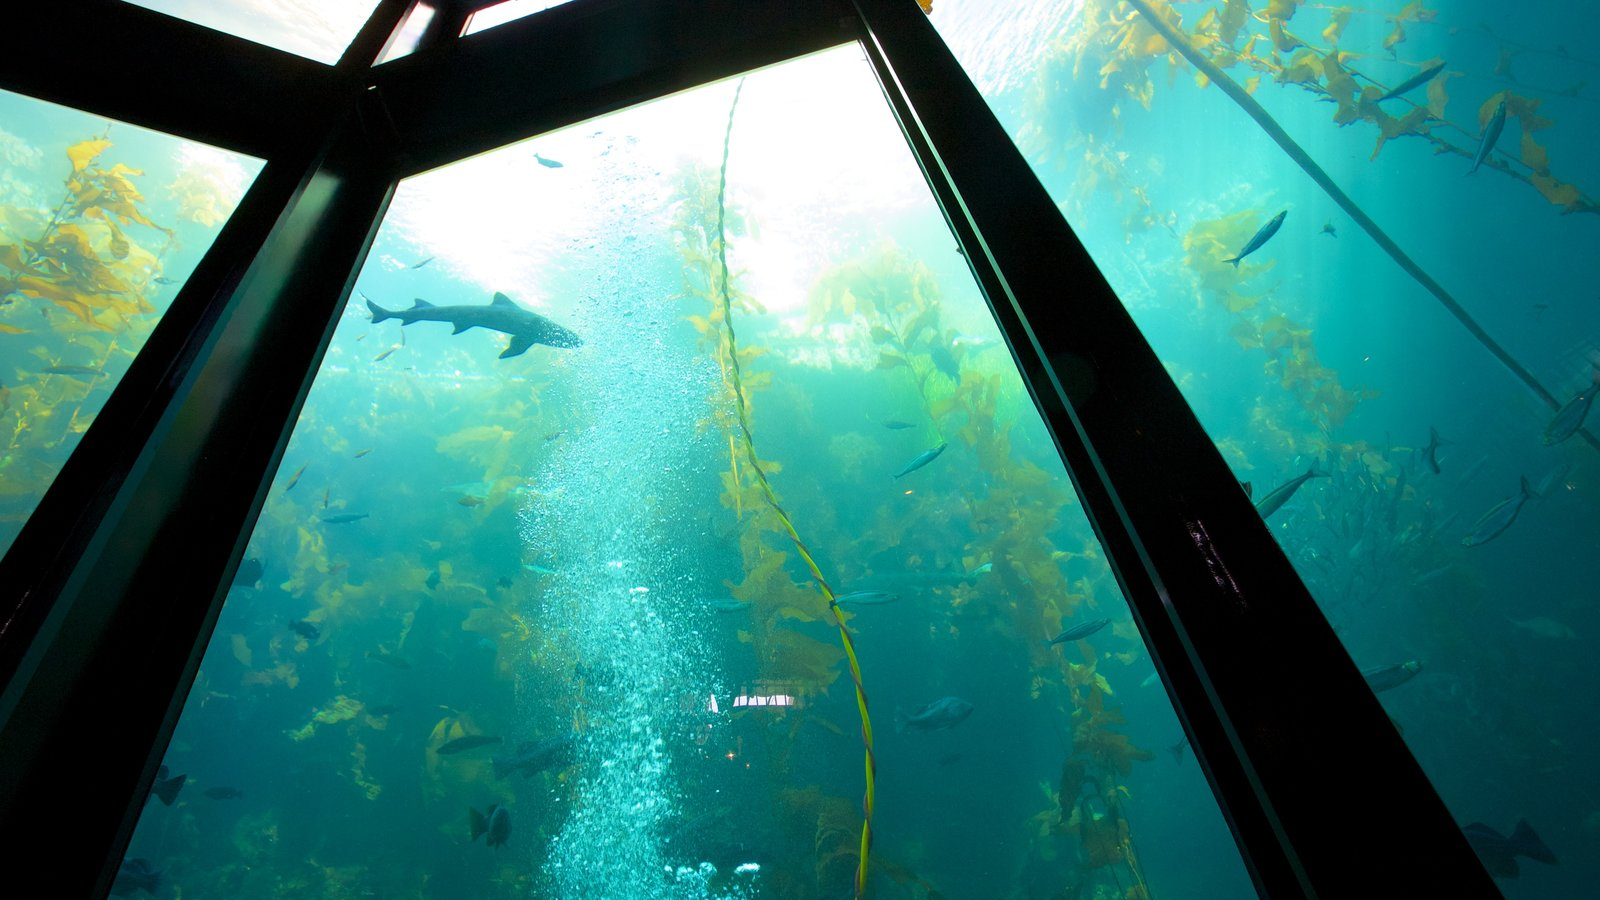 Monterey Bay Aquarium showing interior views and marine life